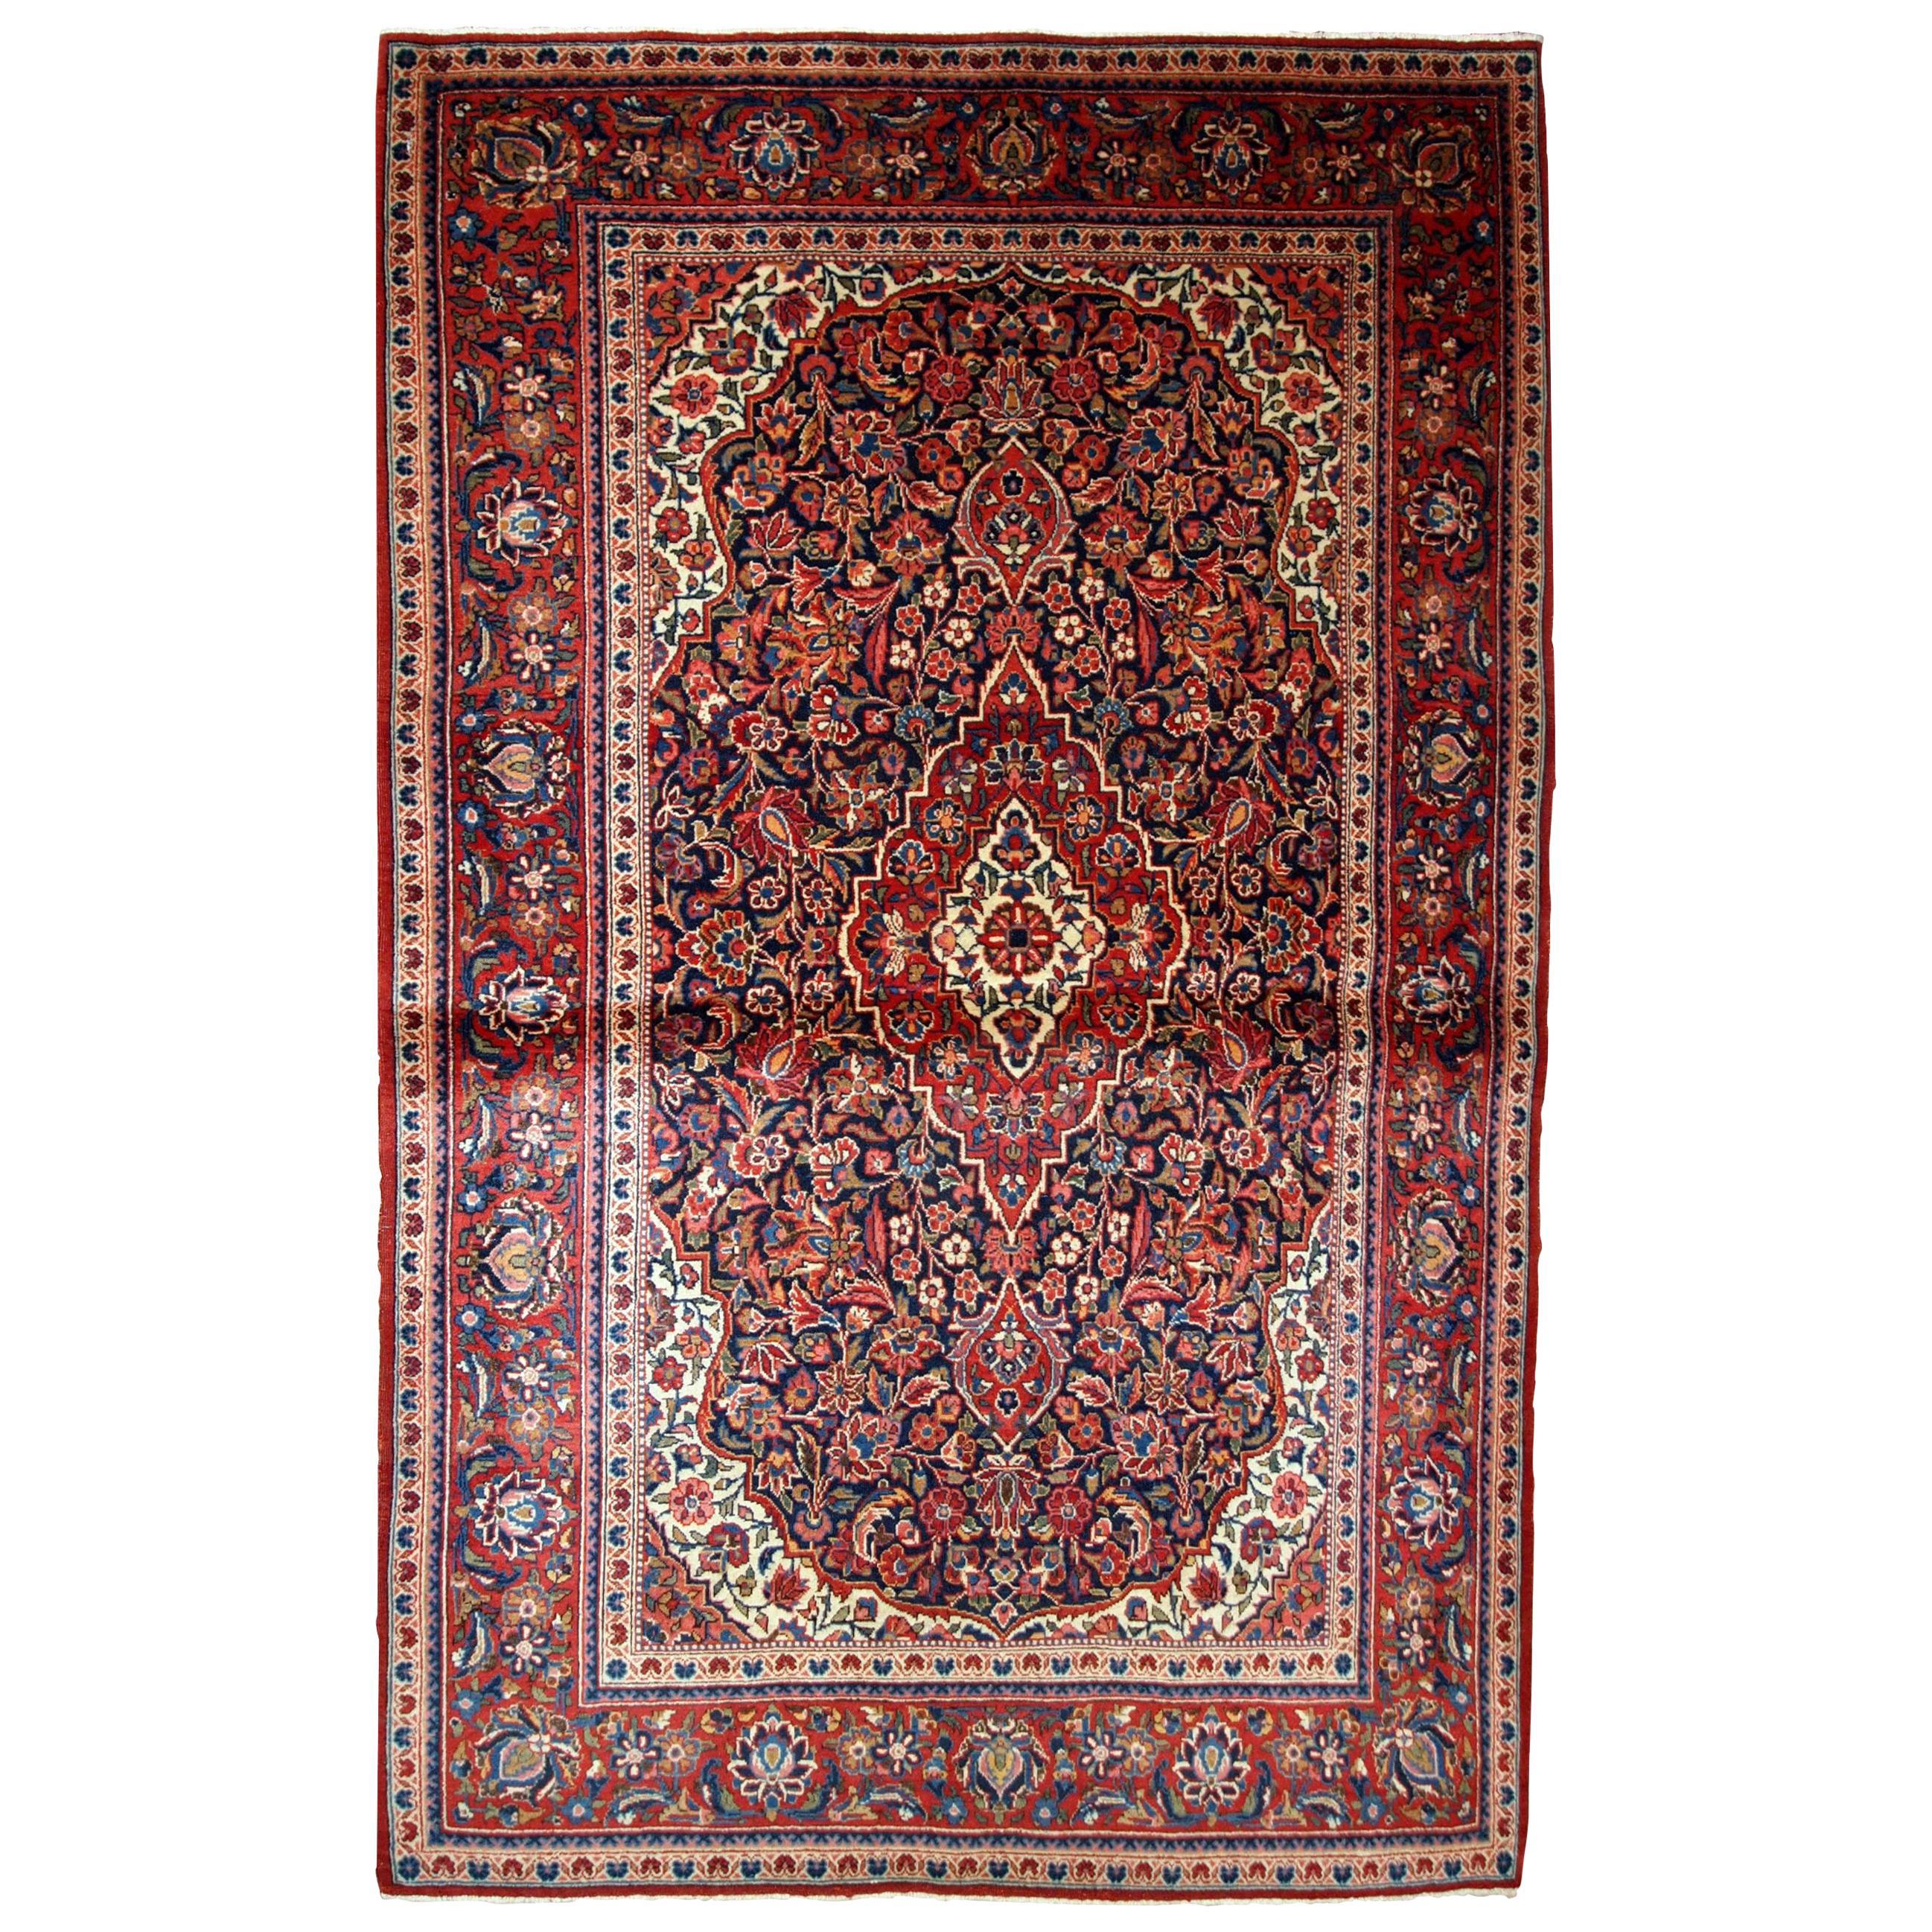 Handmade Antique Kashan Style Rug, 1910s, 1B734